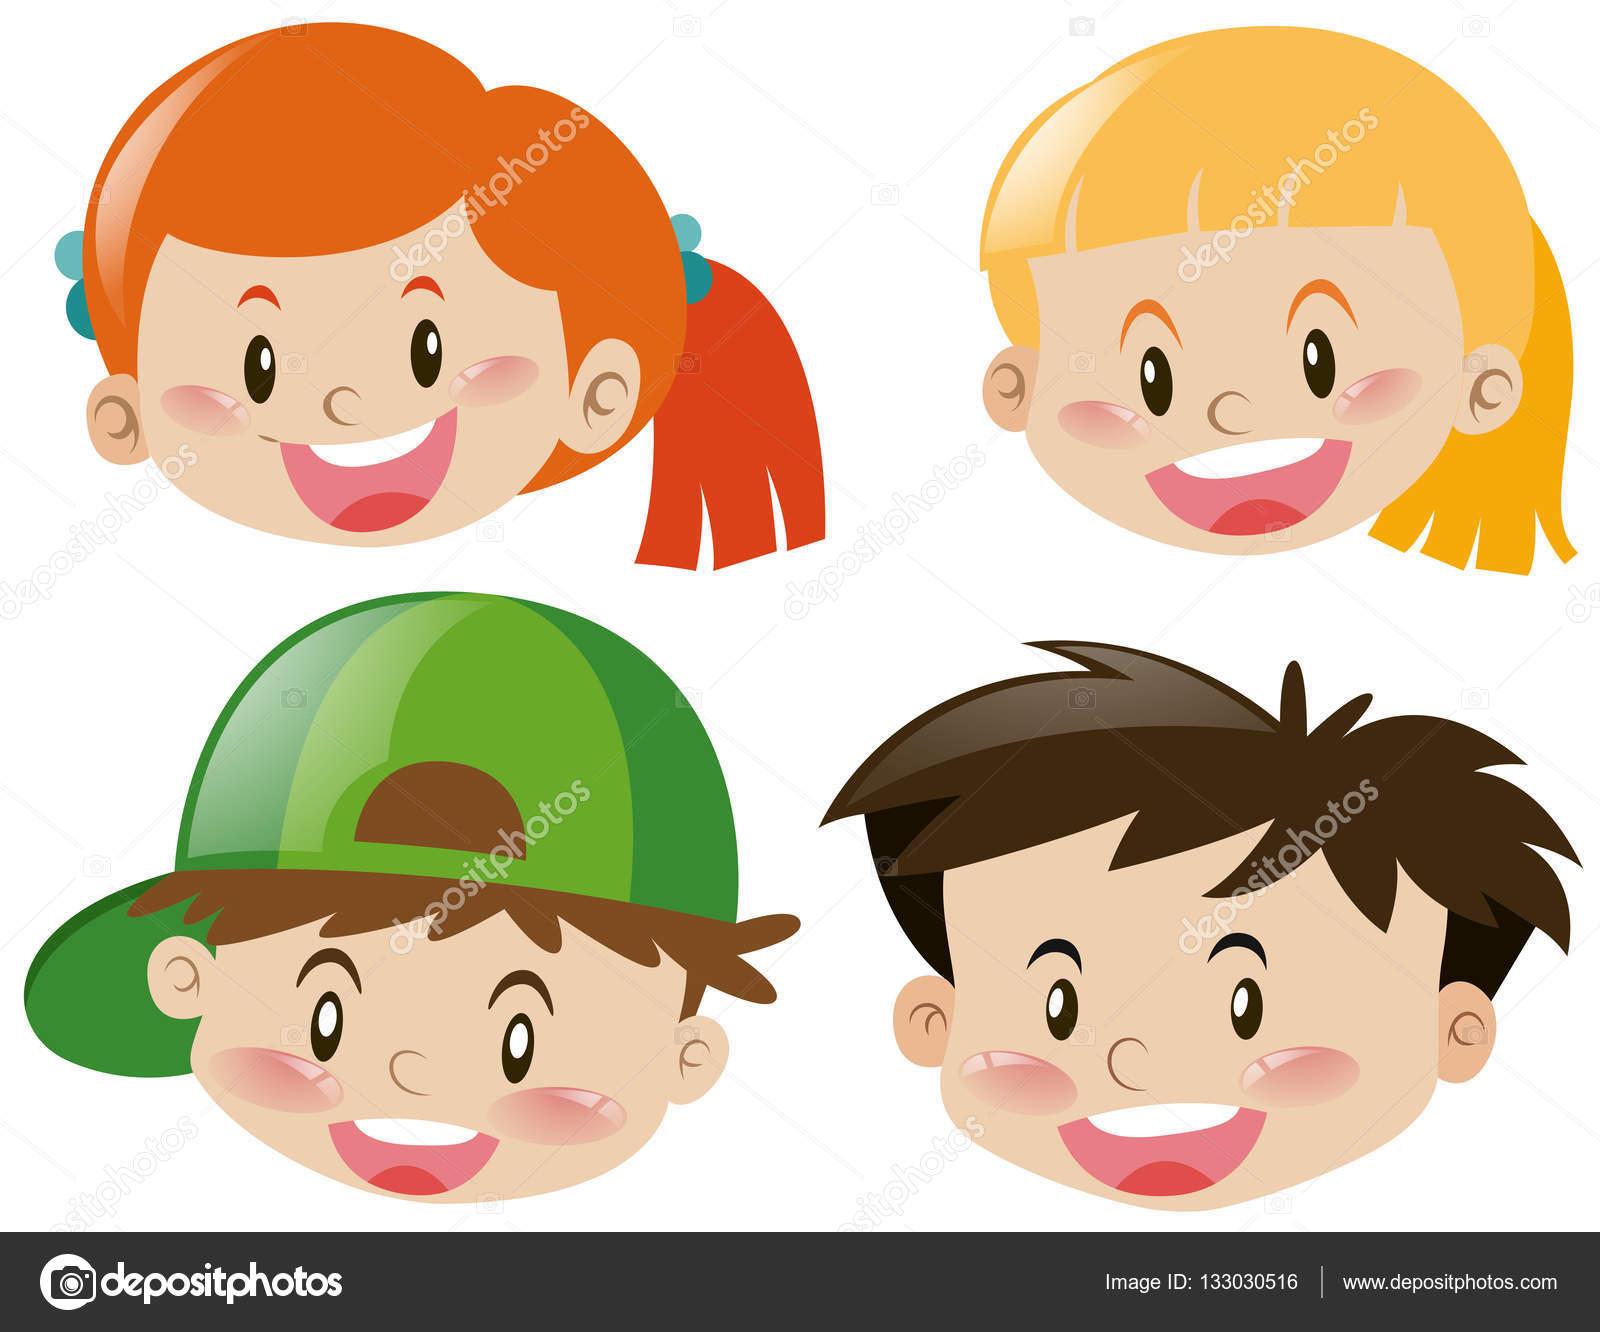 Dibujos Caras De Niños Felices Animadas: Fotos: Caras De Niños Felices